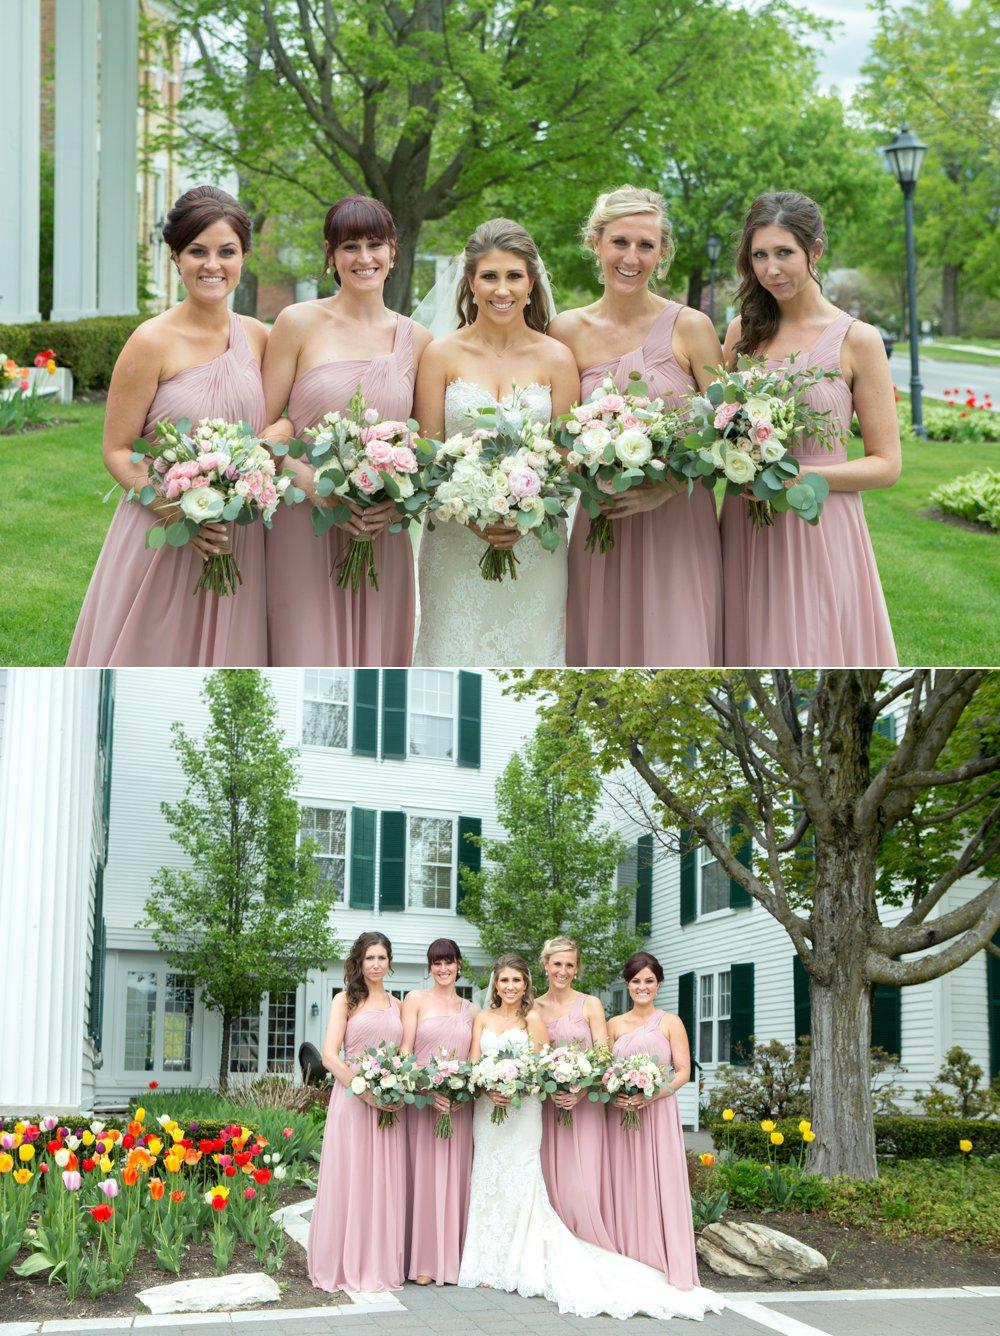 SomerbyJonesPhotography_EquinoxVermont_Wedding_0015.jpg